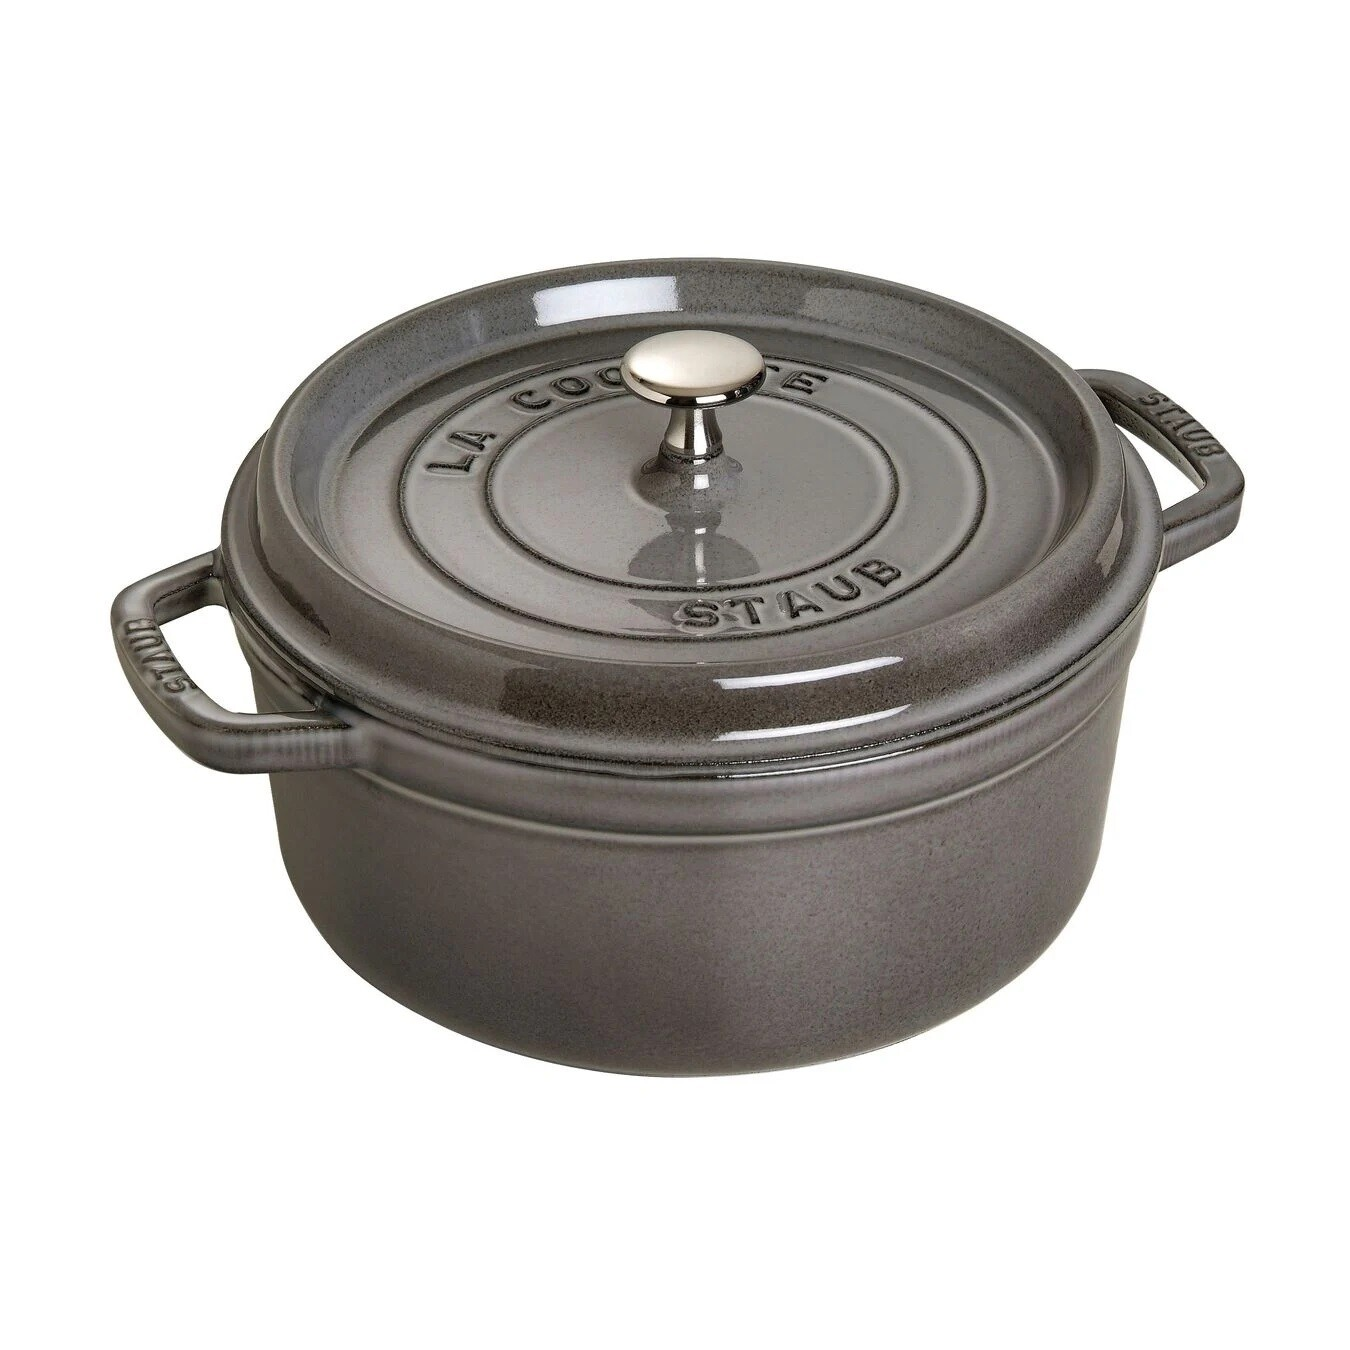 STAUB 'la cocotte' ronde stoofpot 24cm / 3,8L grafietgrijs  PROMO 239,00 -20%